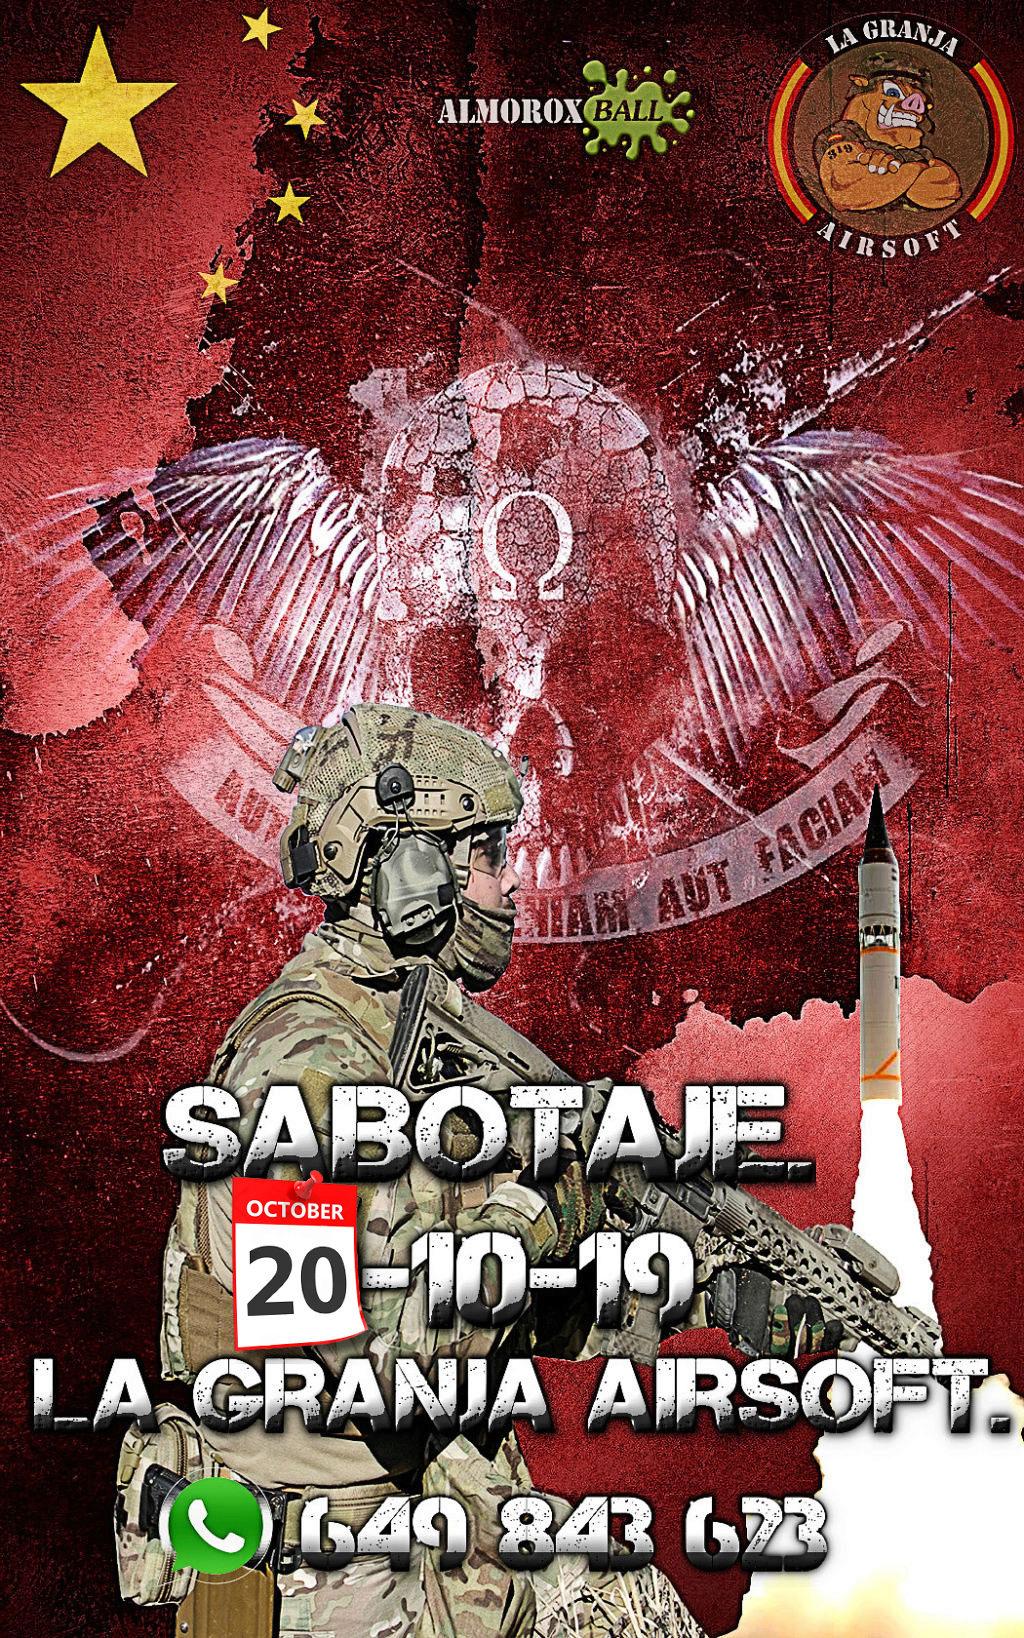 SABOTAJE. PARTIDA ABIERTA. 20-10-19. LA GRANJA AIRSOFT. Cartel61